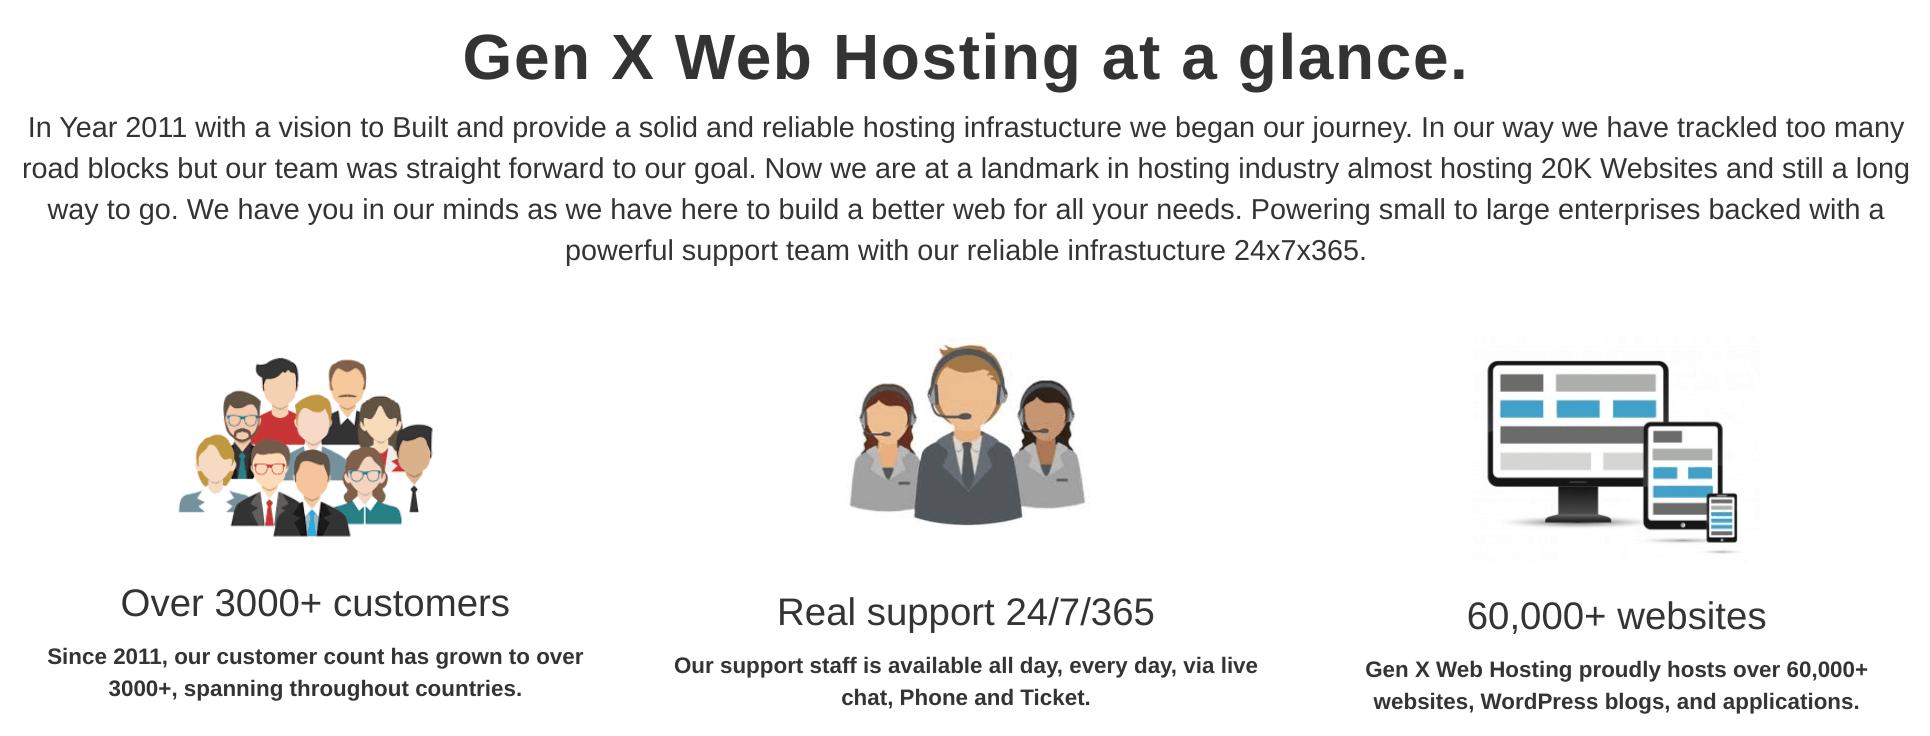 Gen X Web Hosting